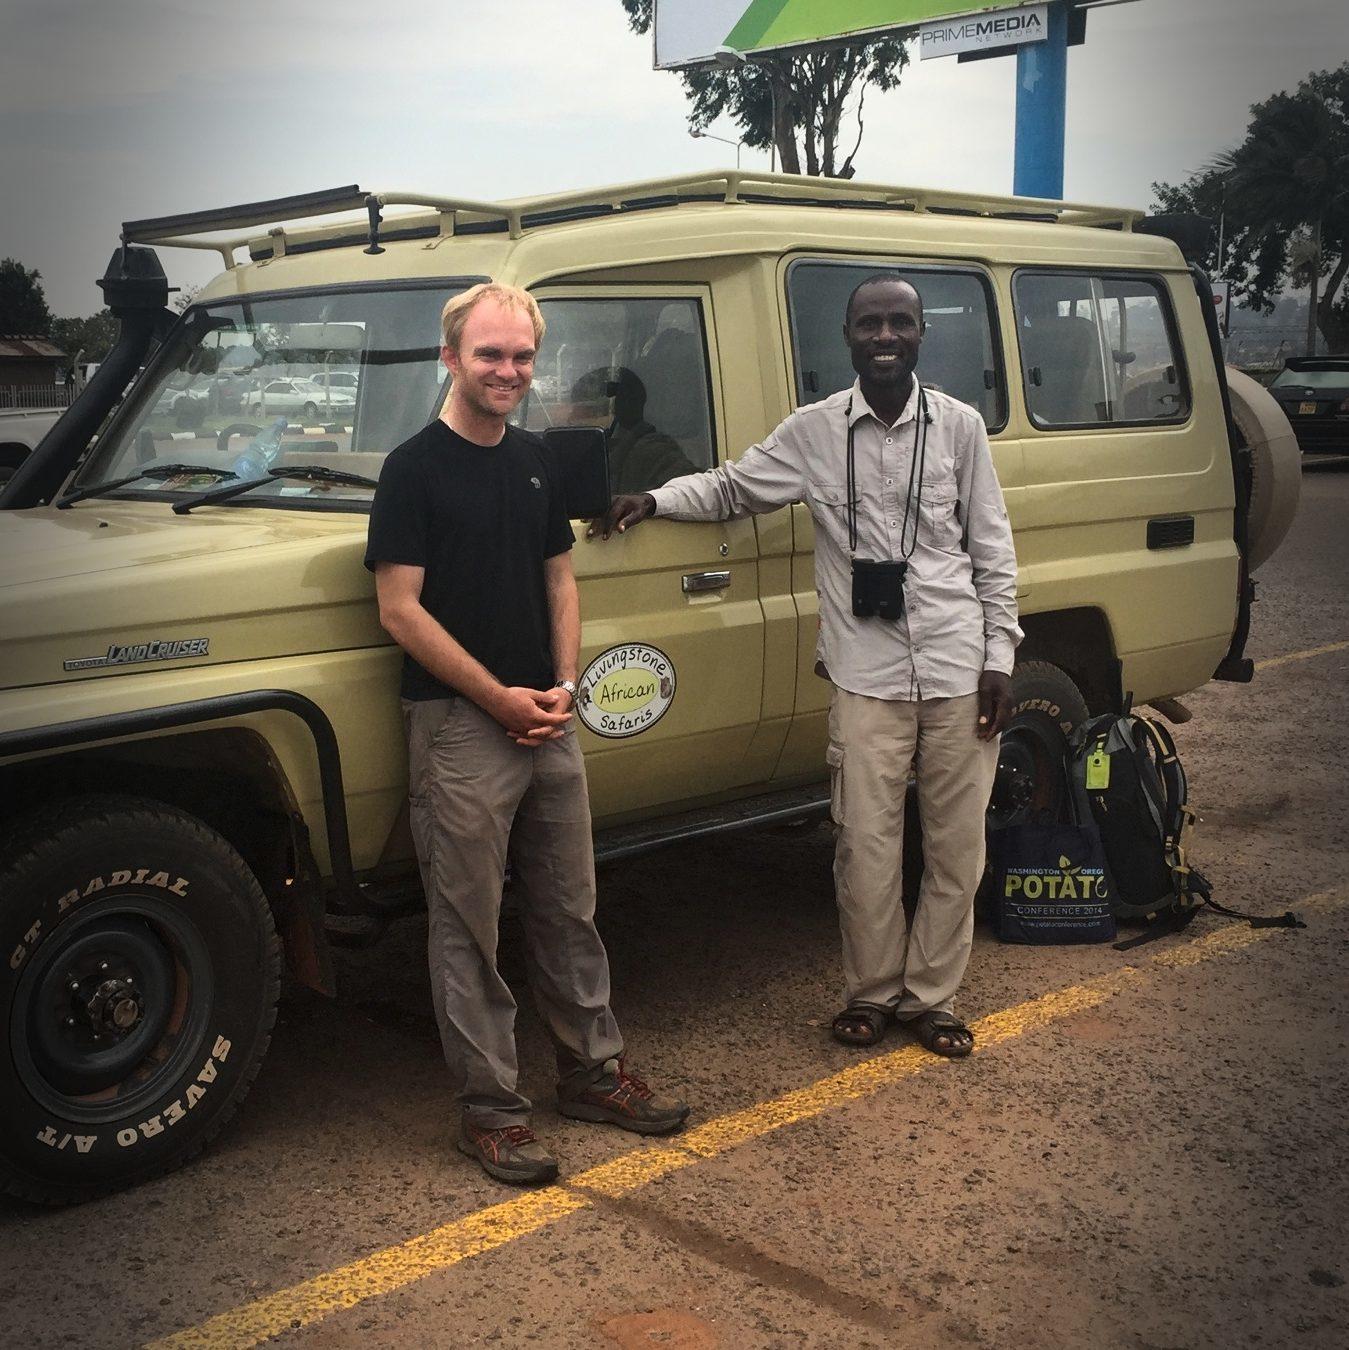 Noah and Livingstone in Entebbe. Noah Strycker